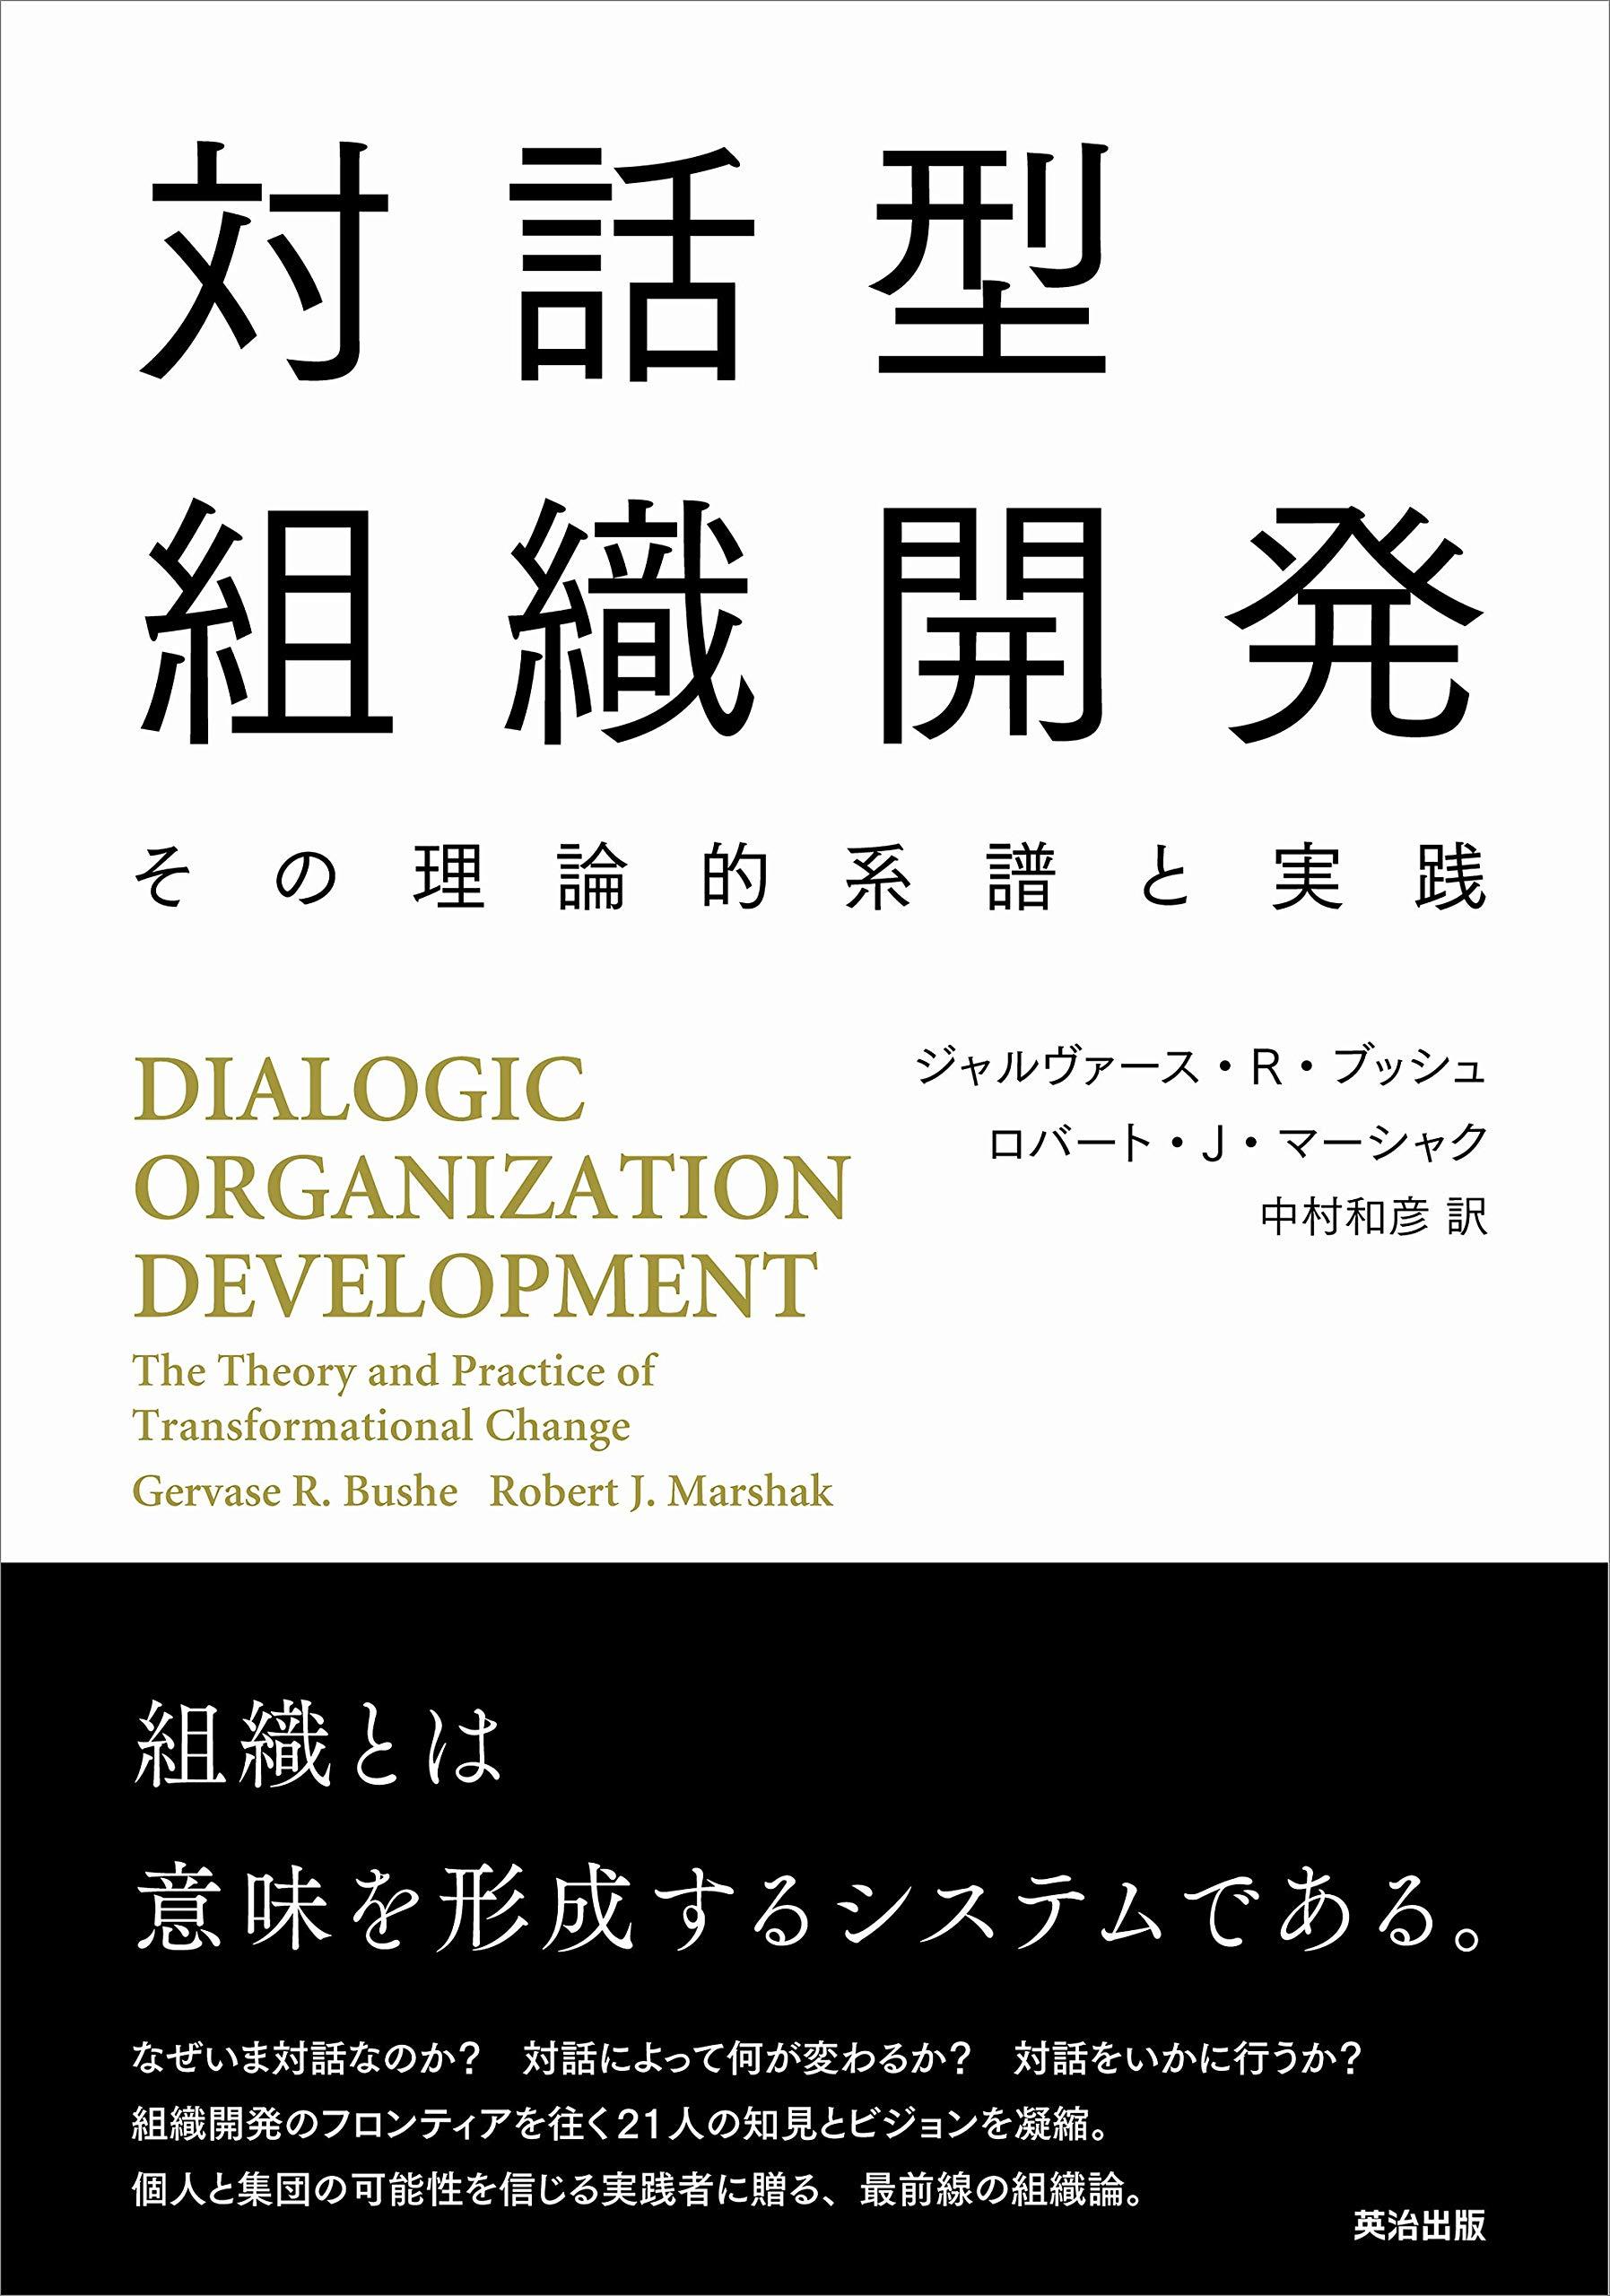 意味 development